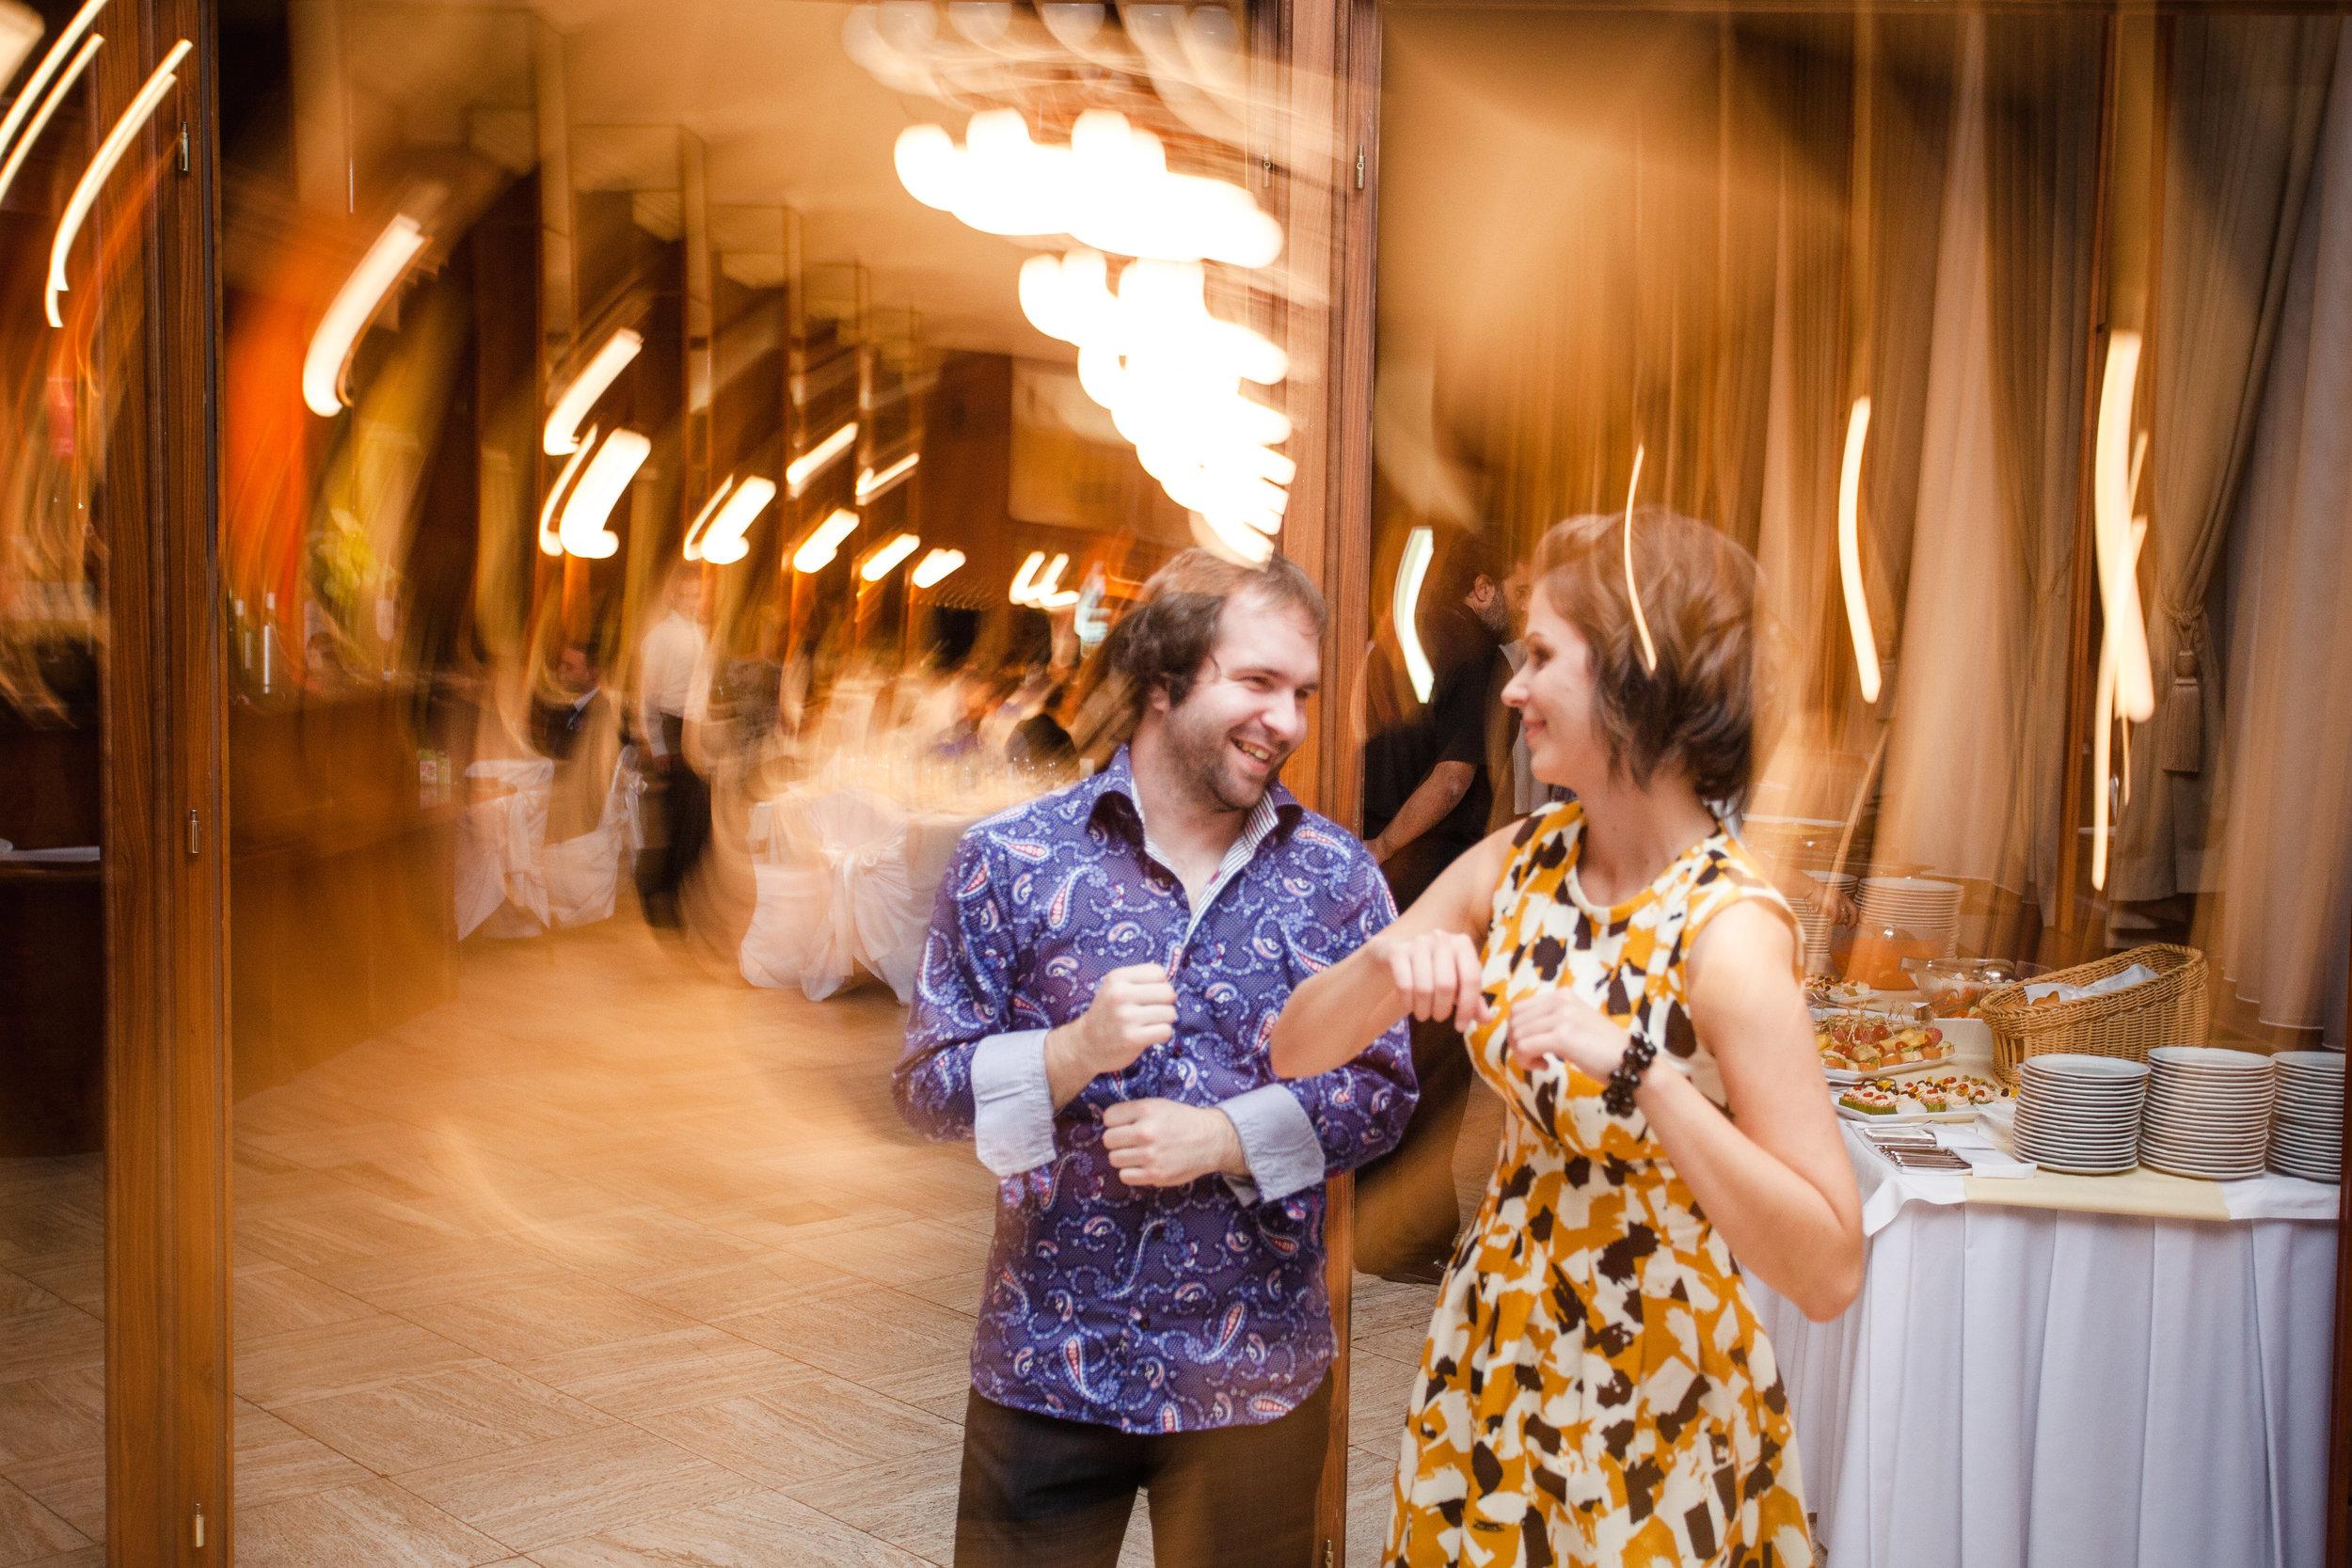 destination-wedding-photographer-slovakia-bratislava-reception-dancing-6.jpg